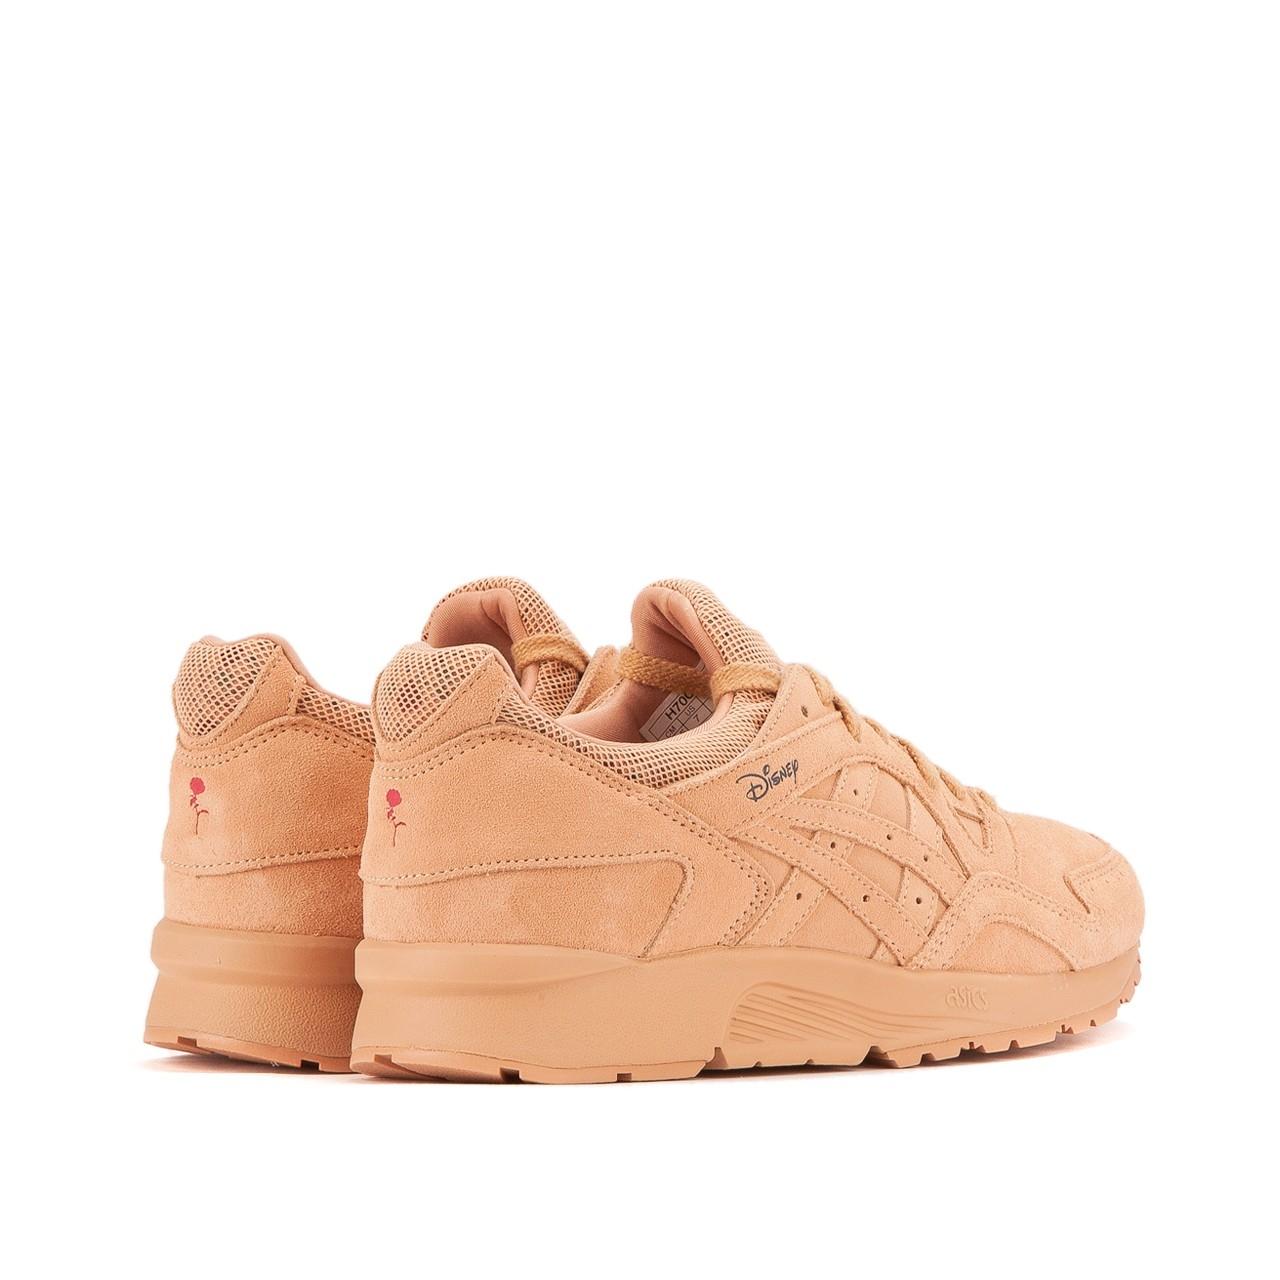 hot sale online 7e43d d8ea7 Giày sneaker Asics Gel Lyte V Disney chính hãng 2019 ...